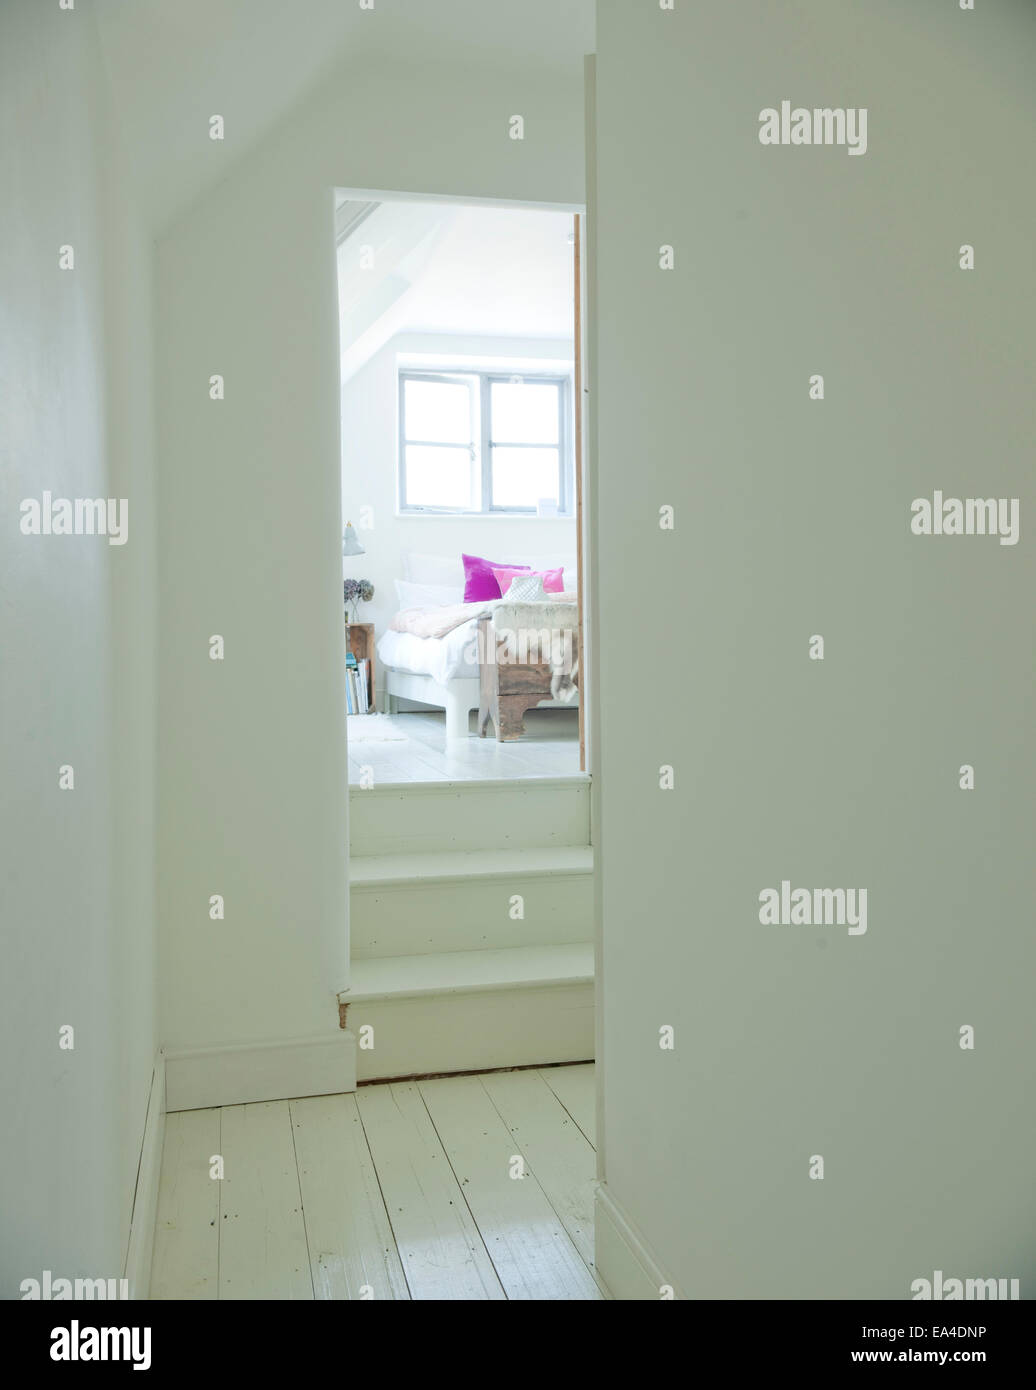 Interiors Bedroom Attic Traditional Stockfotos & Interiors Bedroom ...